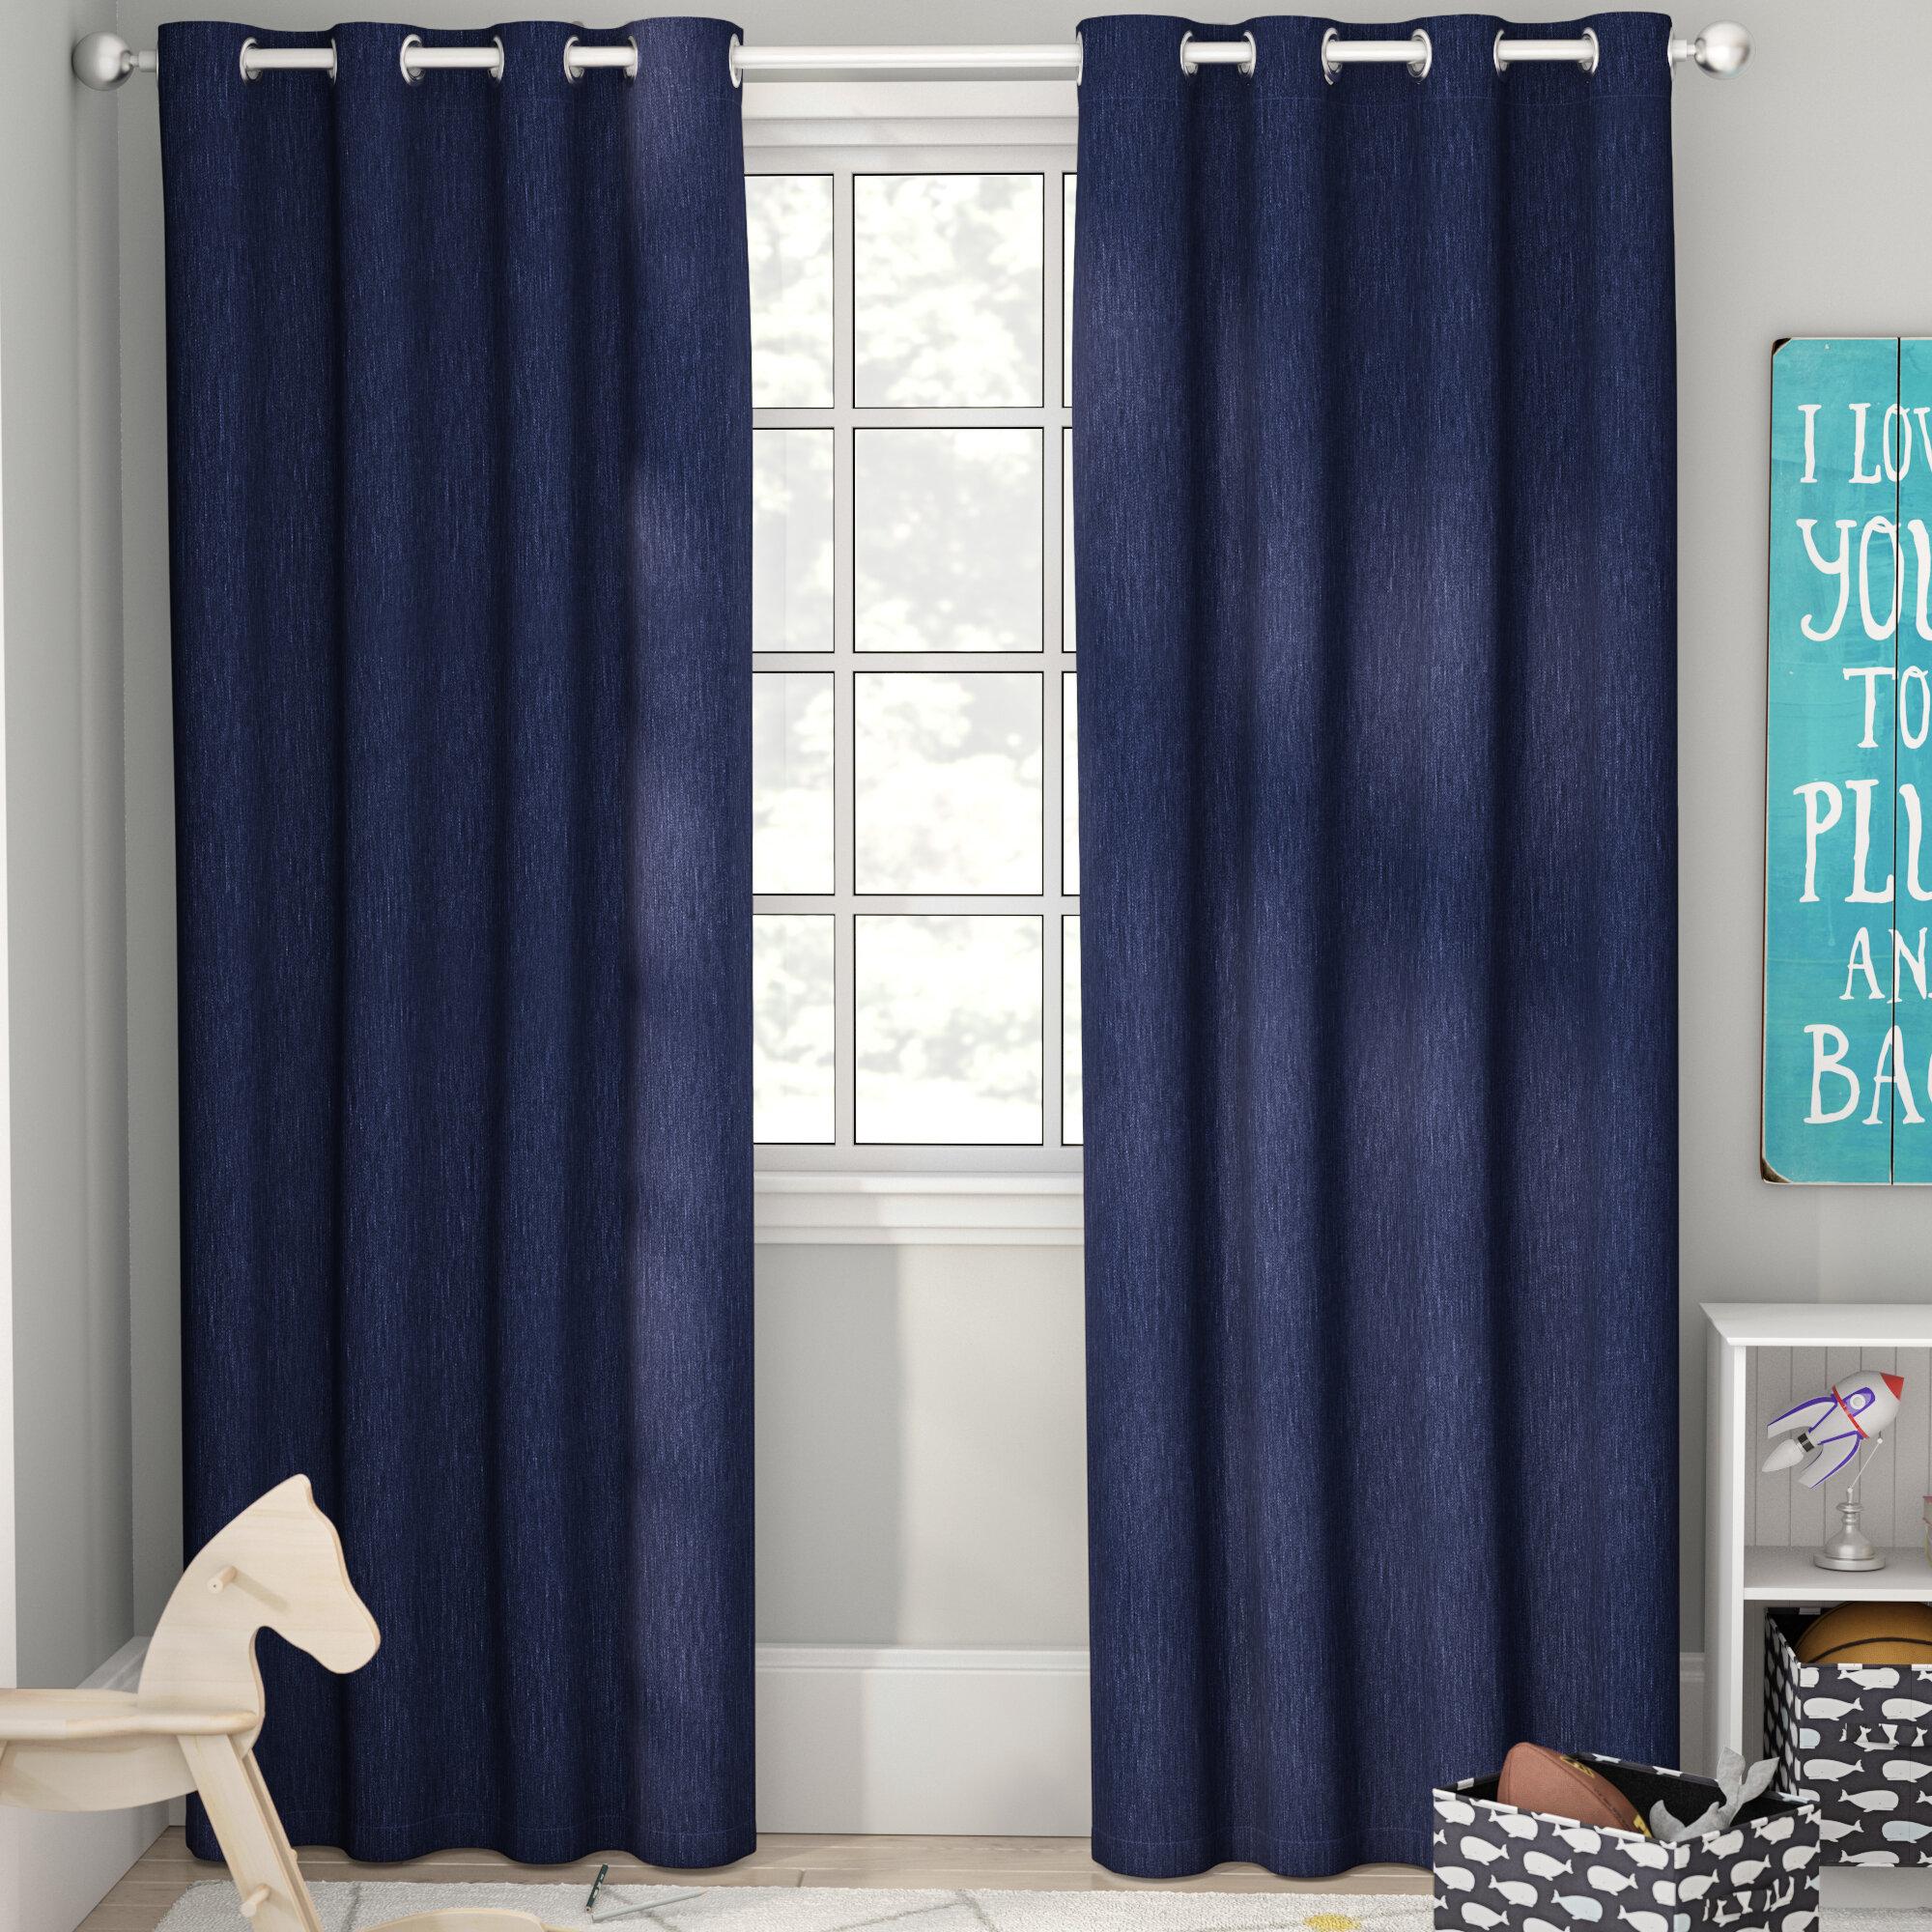 Viv + Rae Tamara Solid Blackout Thermal Grommet Curtain Panels ...